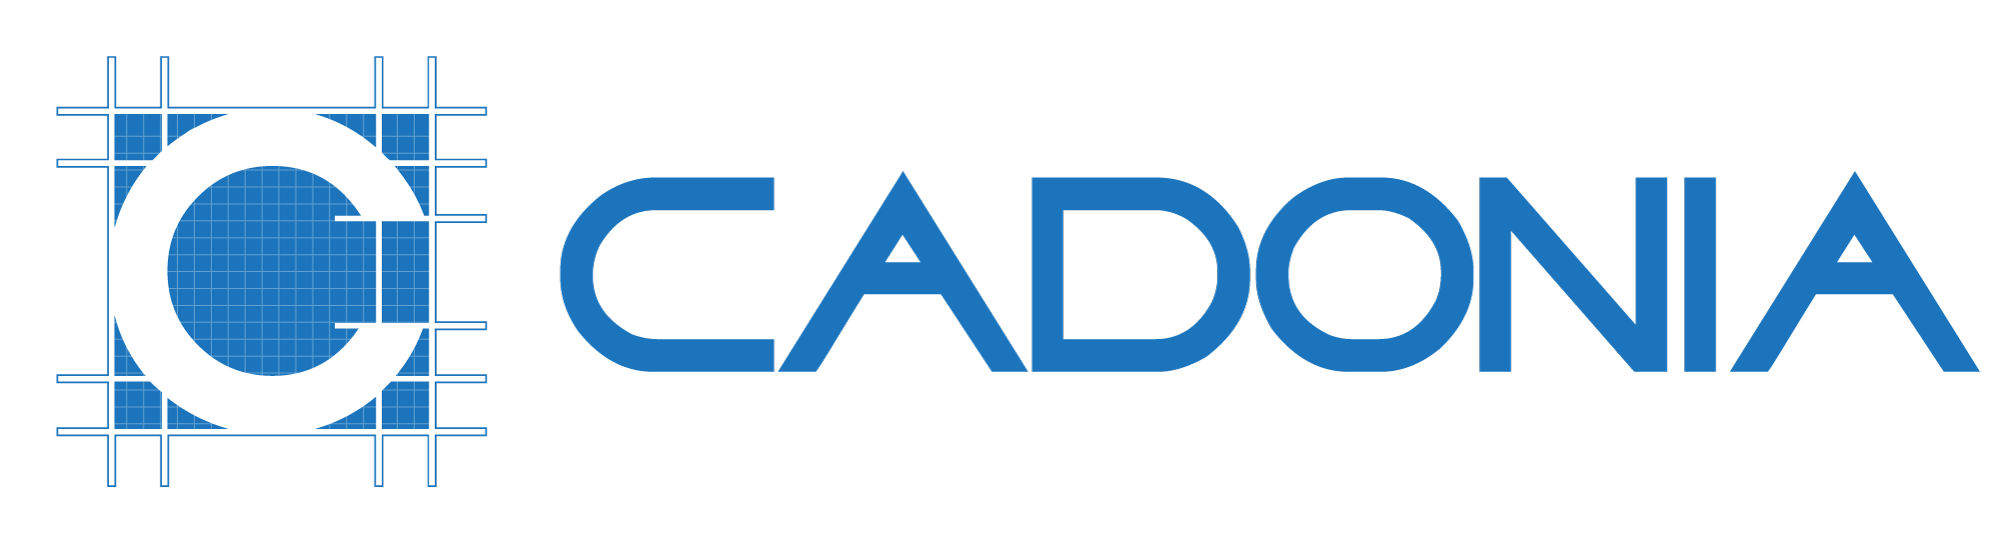 Cadonia logo